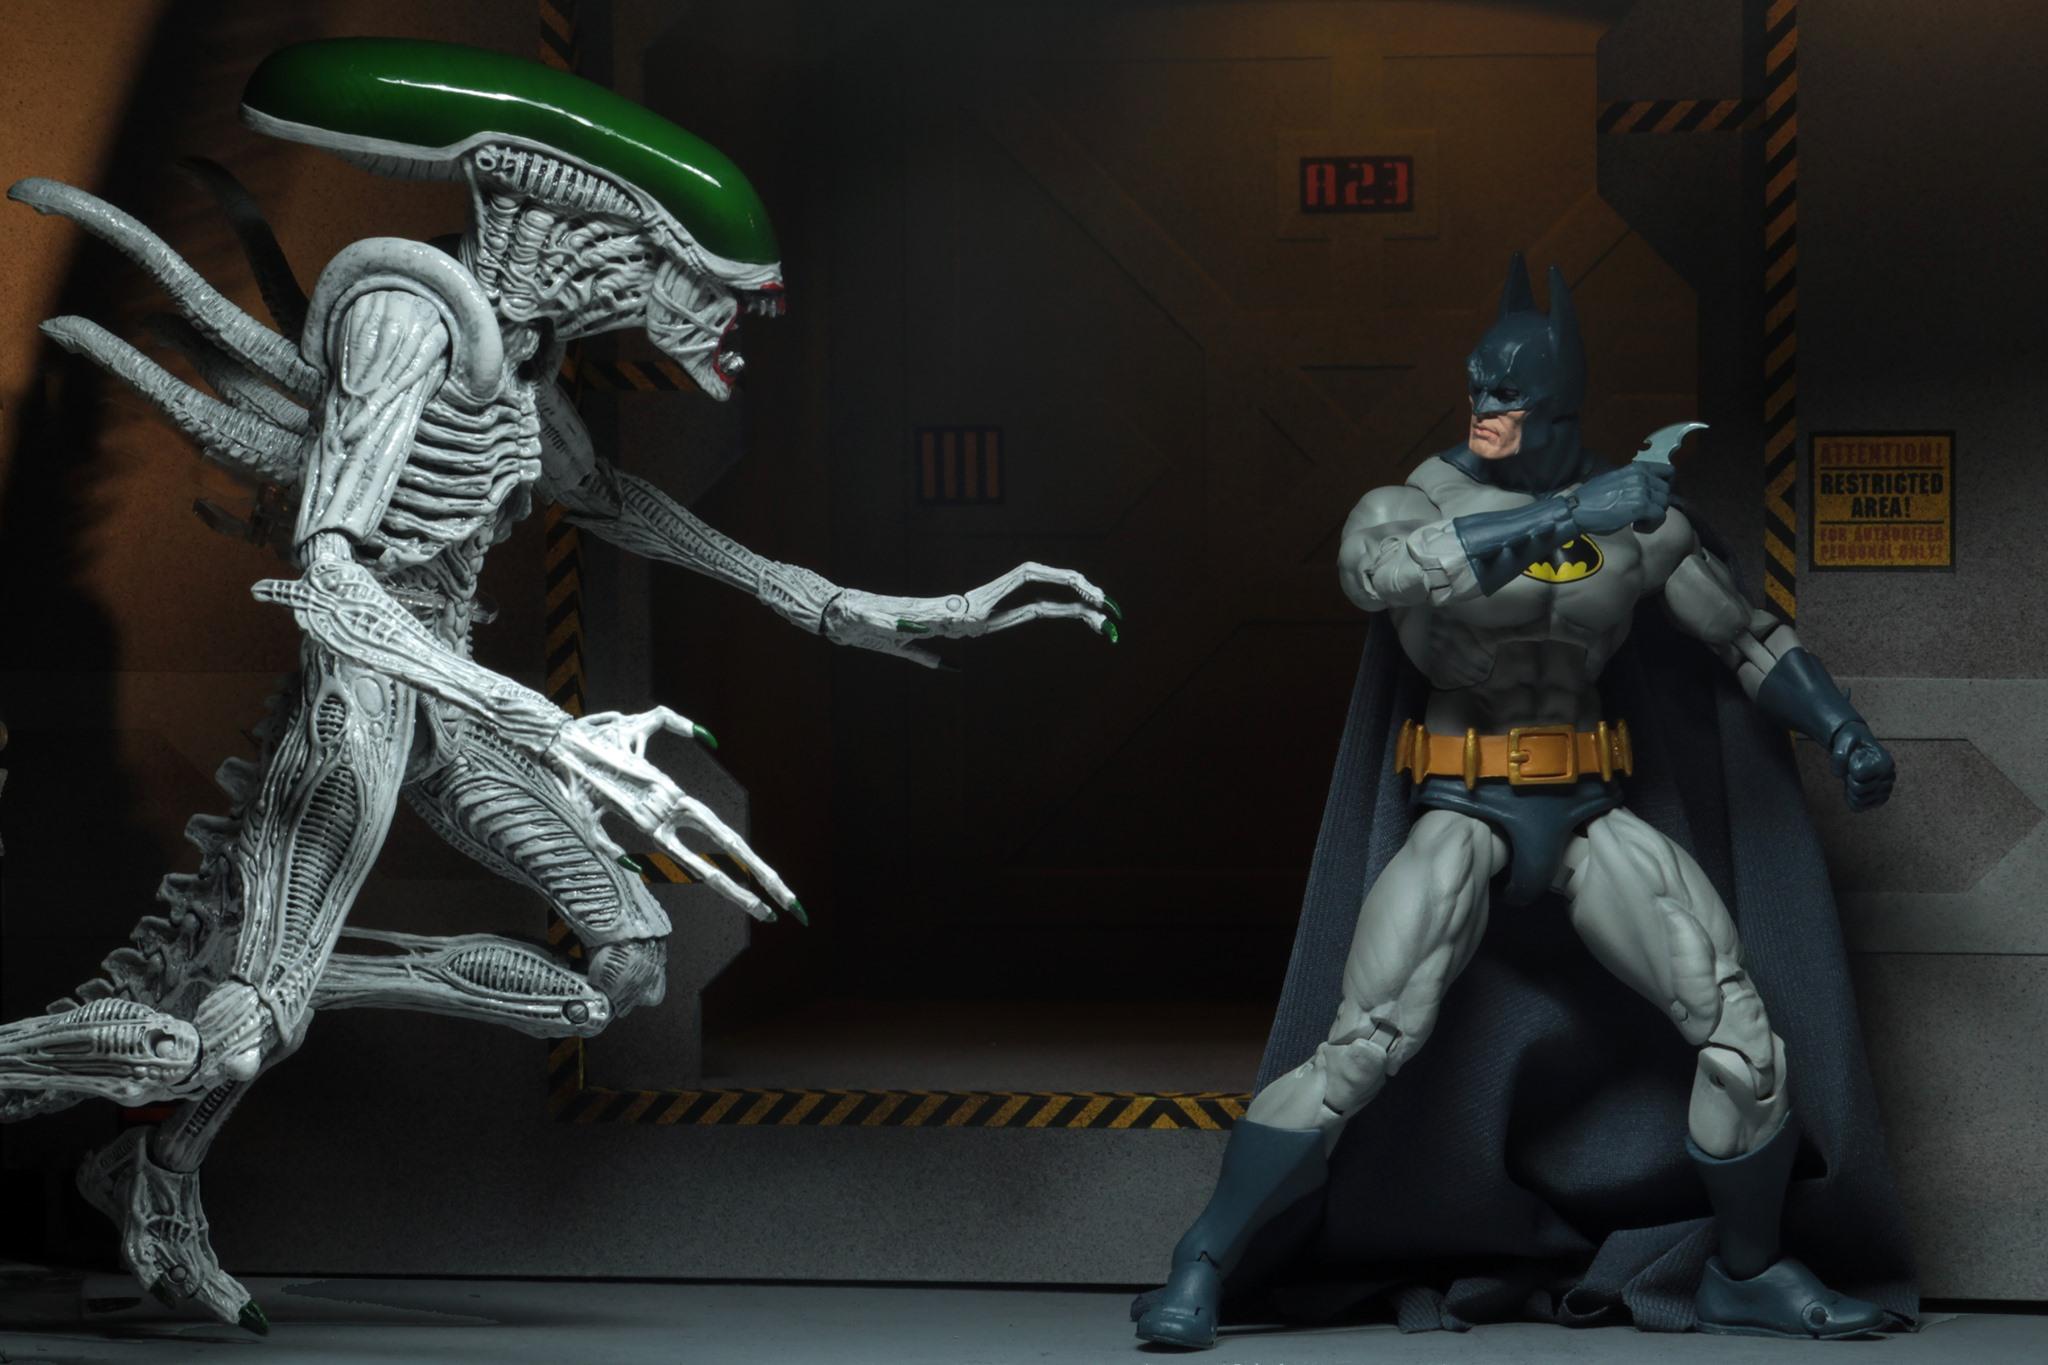 NECA Toys New York Comic-Con 2019 Exclusive – Batman & Alien Figures 2-Pack